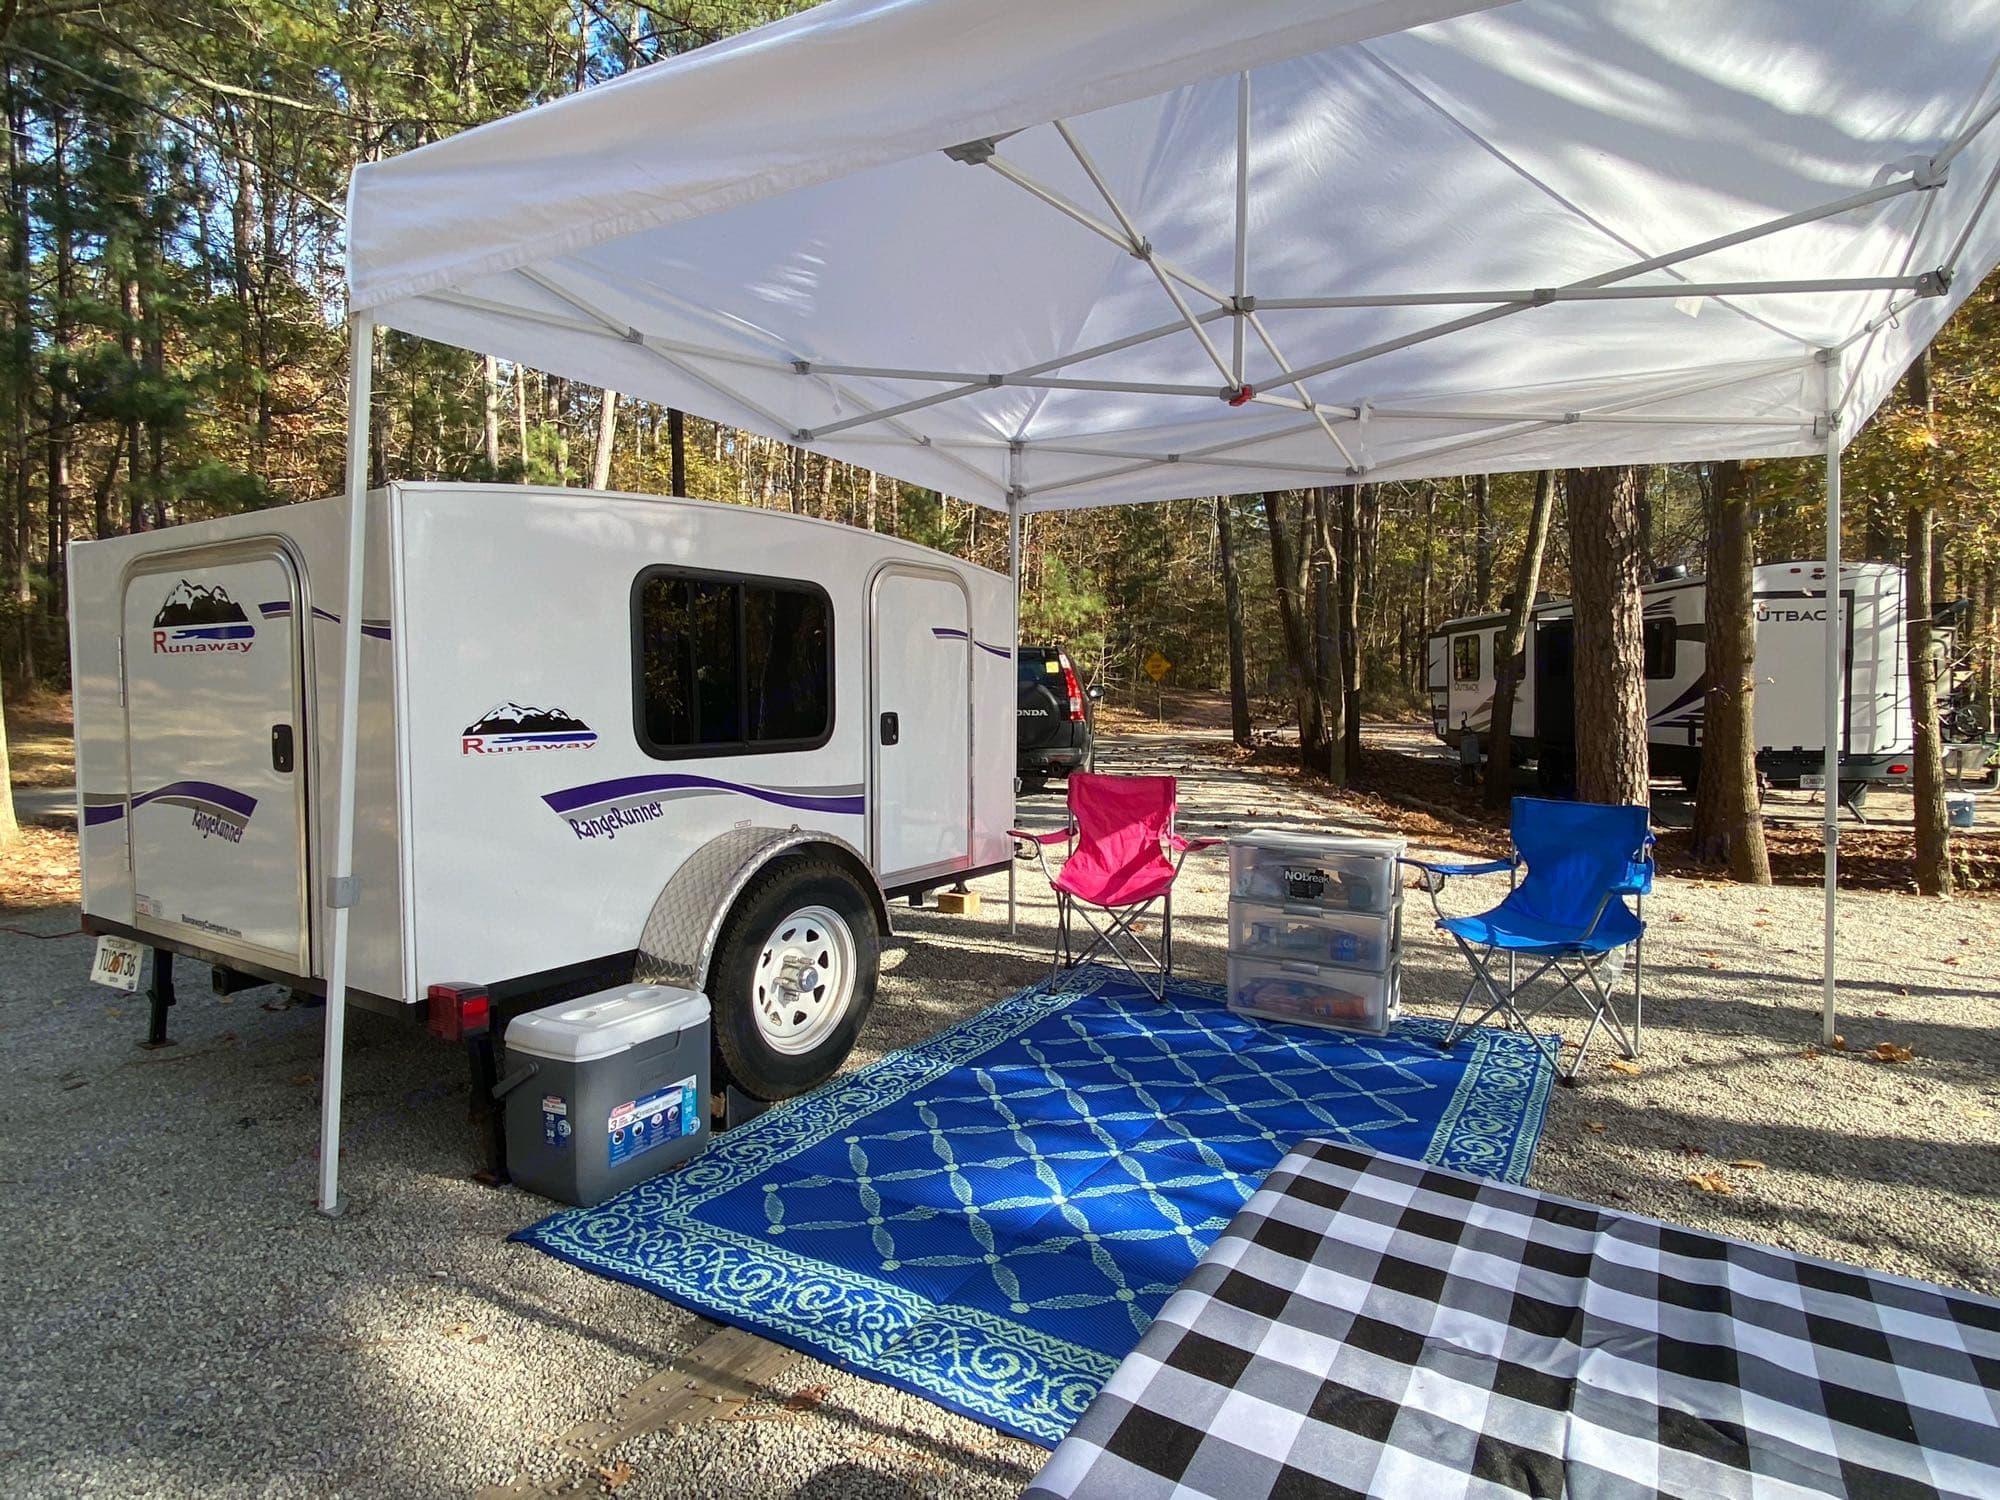 Our camping set up. . Runaway Campers Rangerunner 2019